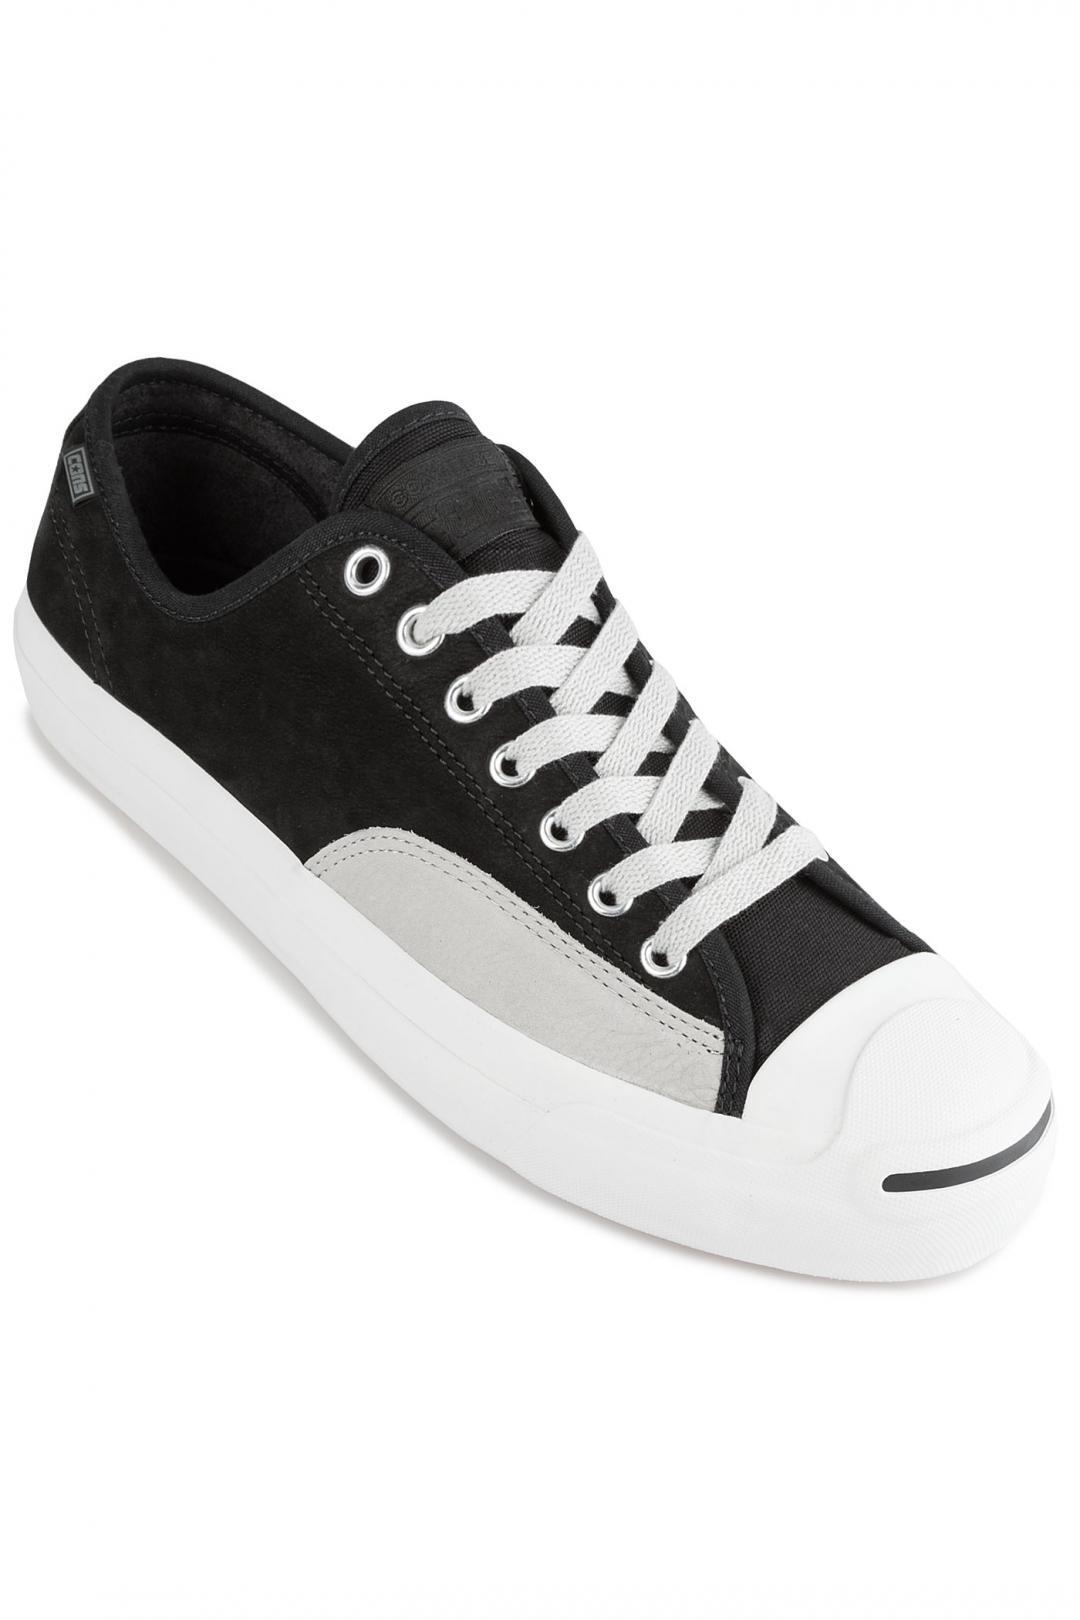 Uomo Converse Jack Purcell Pro black pale grey vintage white | Sneaker